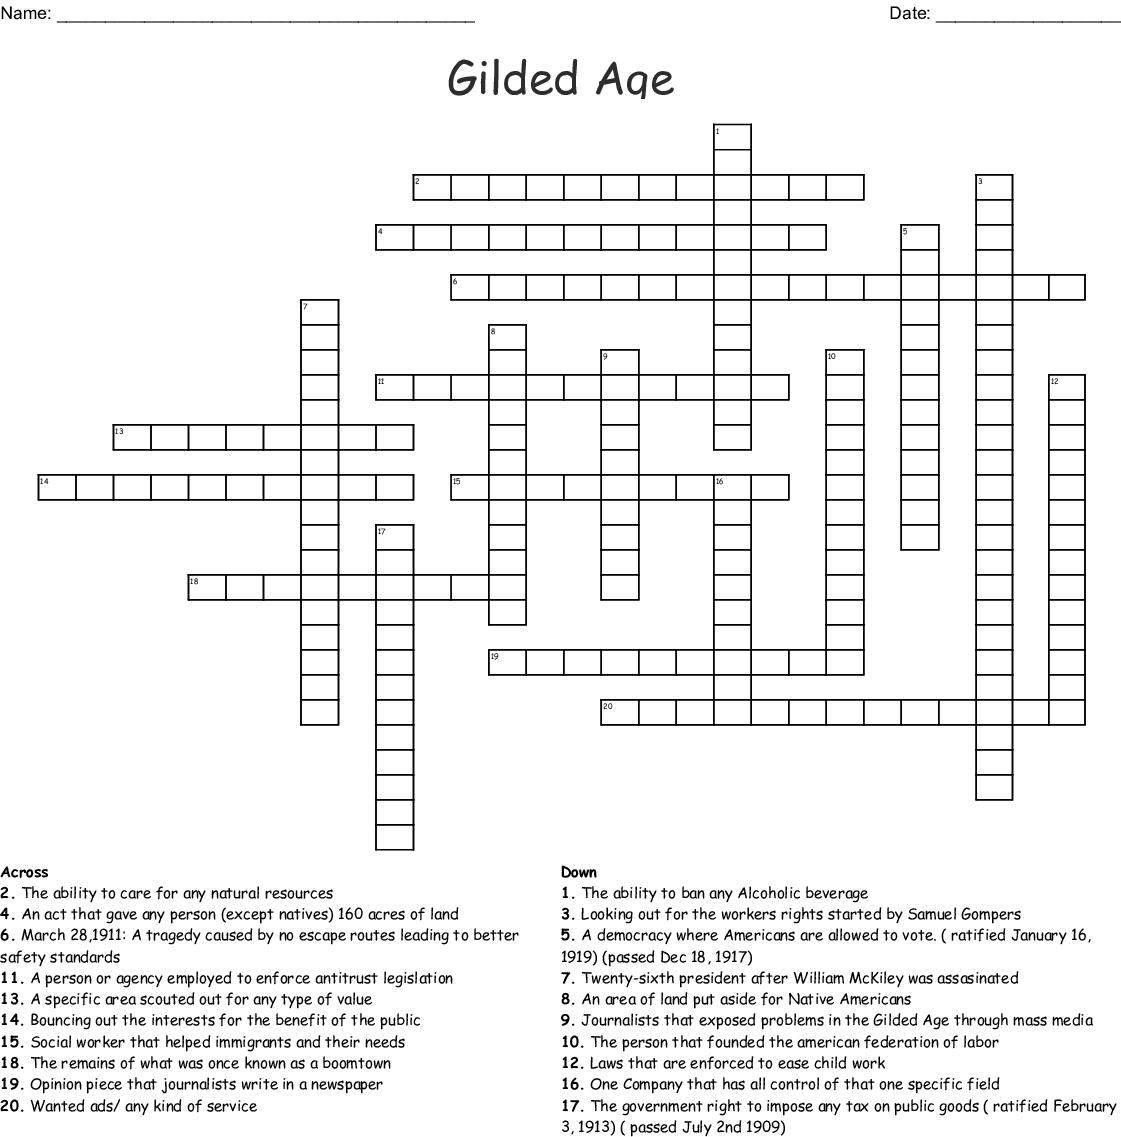 Gilded Age Crossword